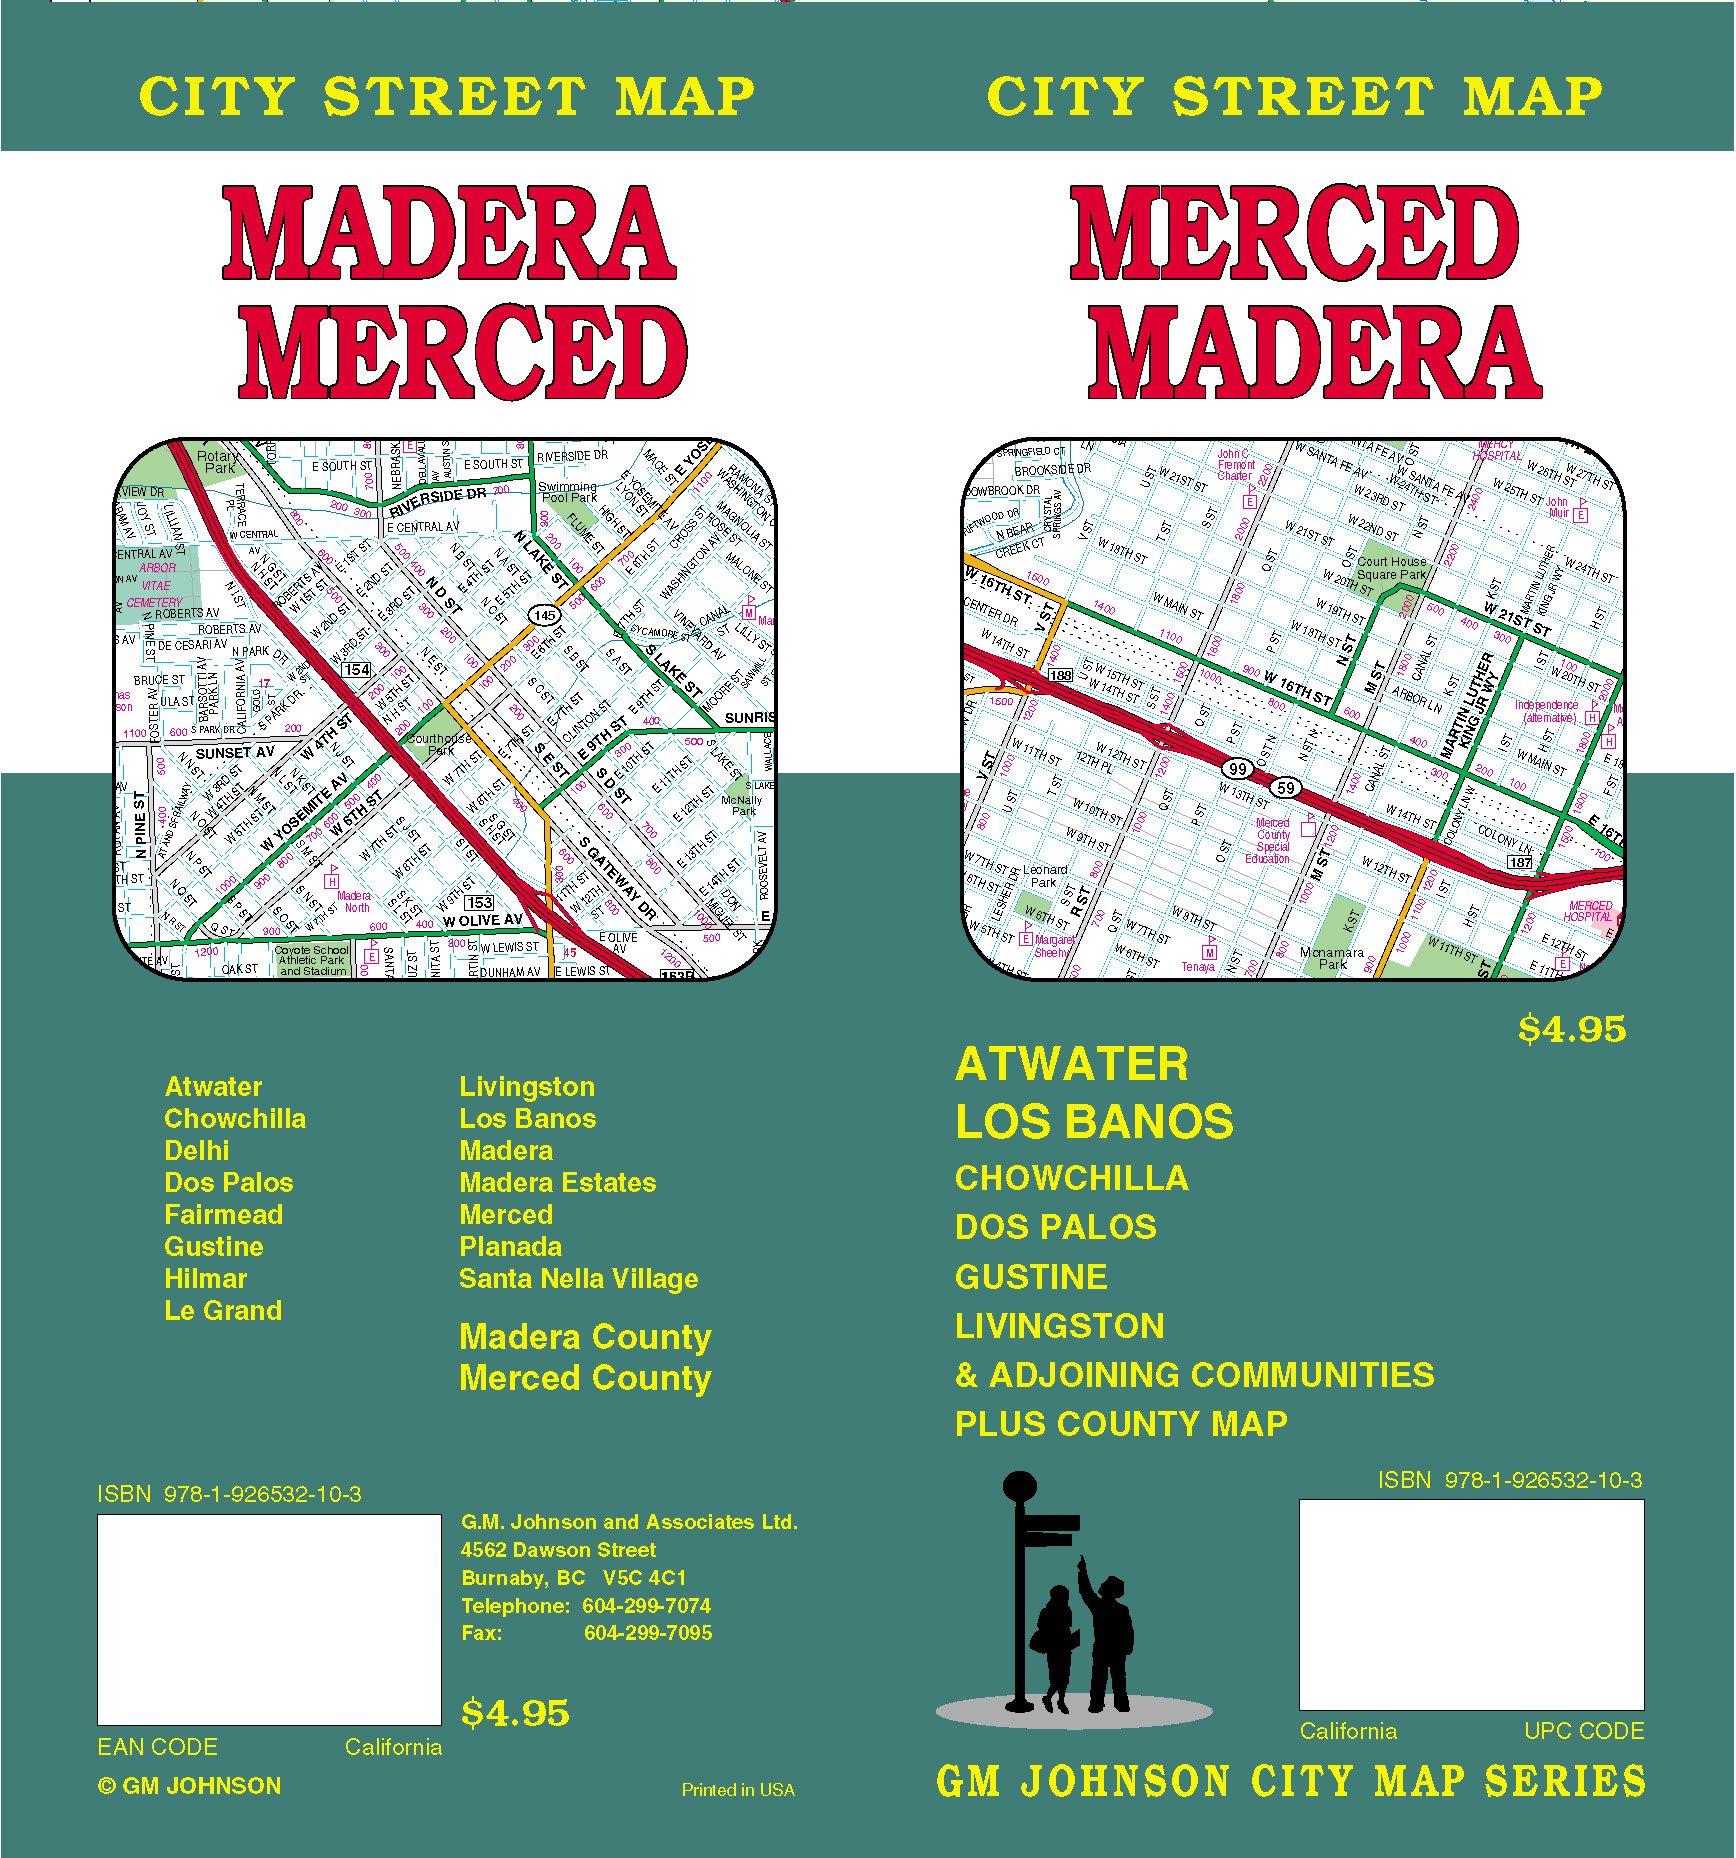 Merced/Madera City Street Map ebook